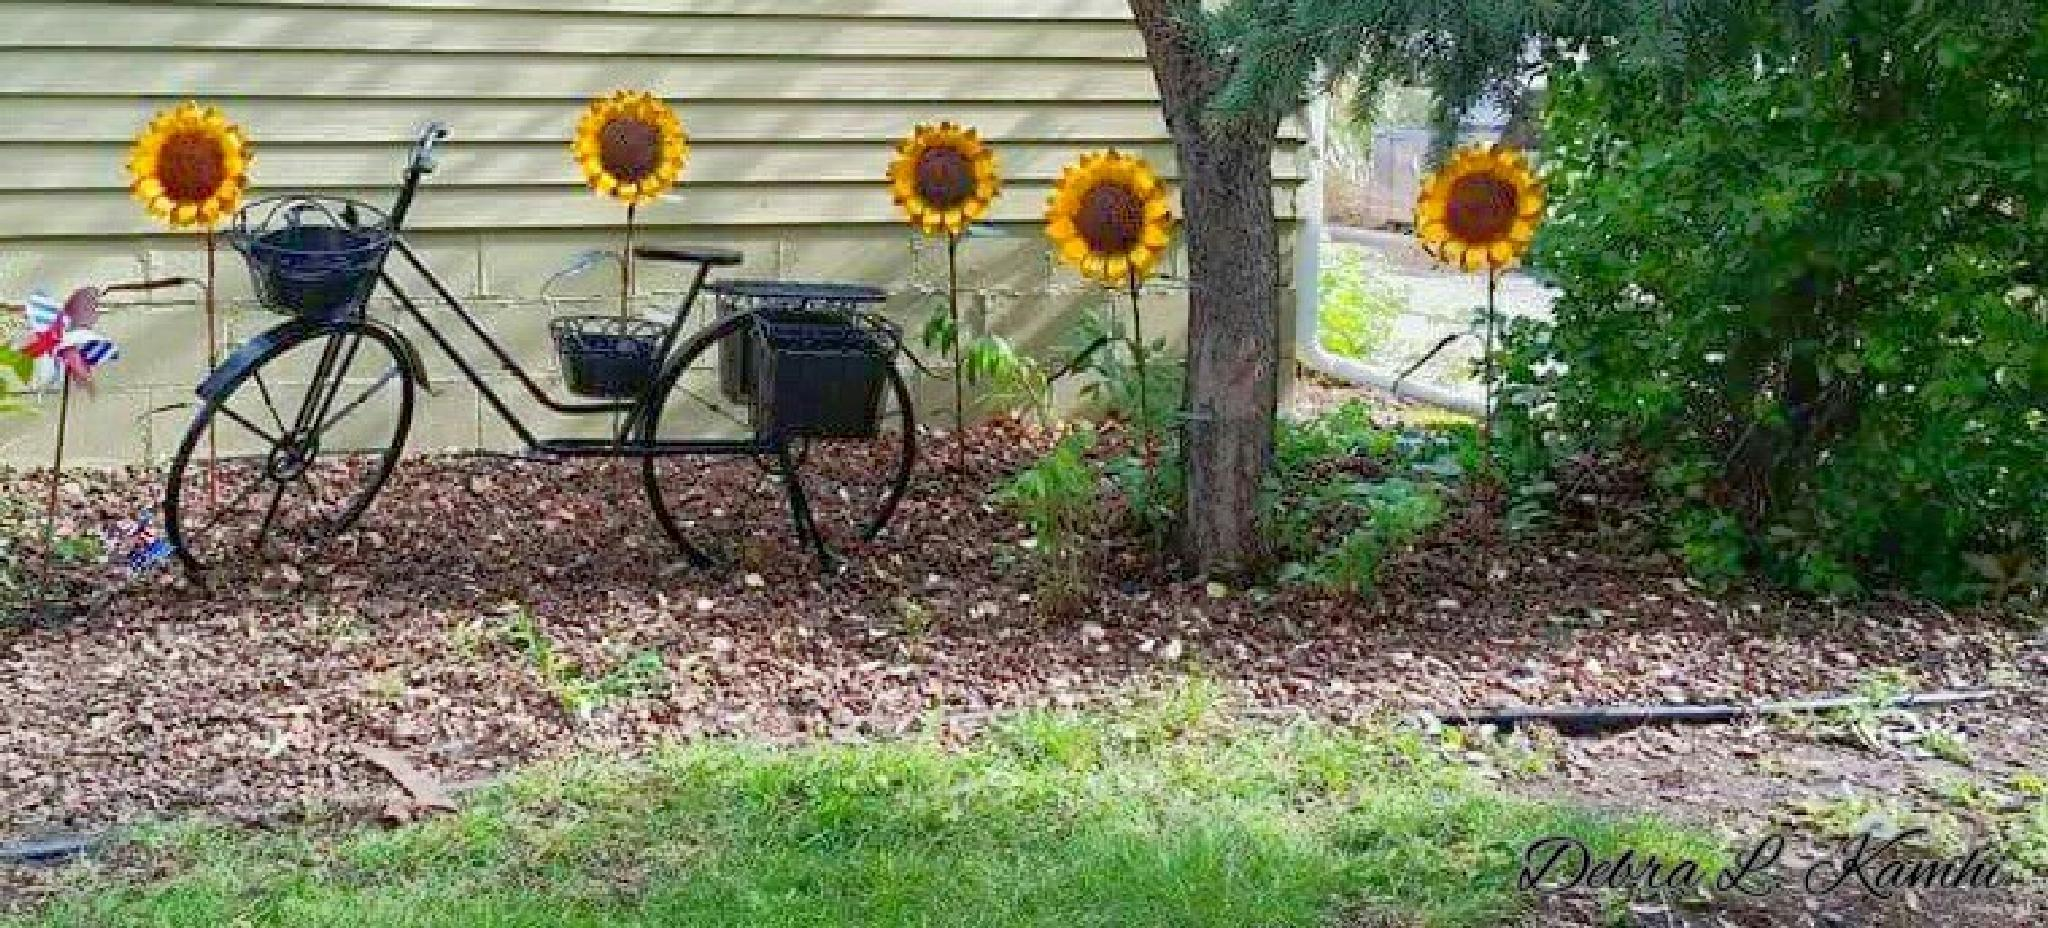 Garden Decor  by debra.kamhi